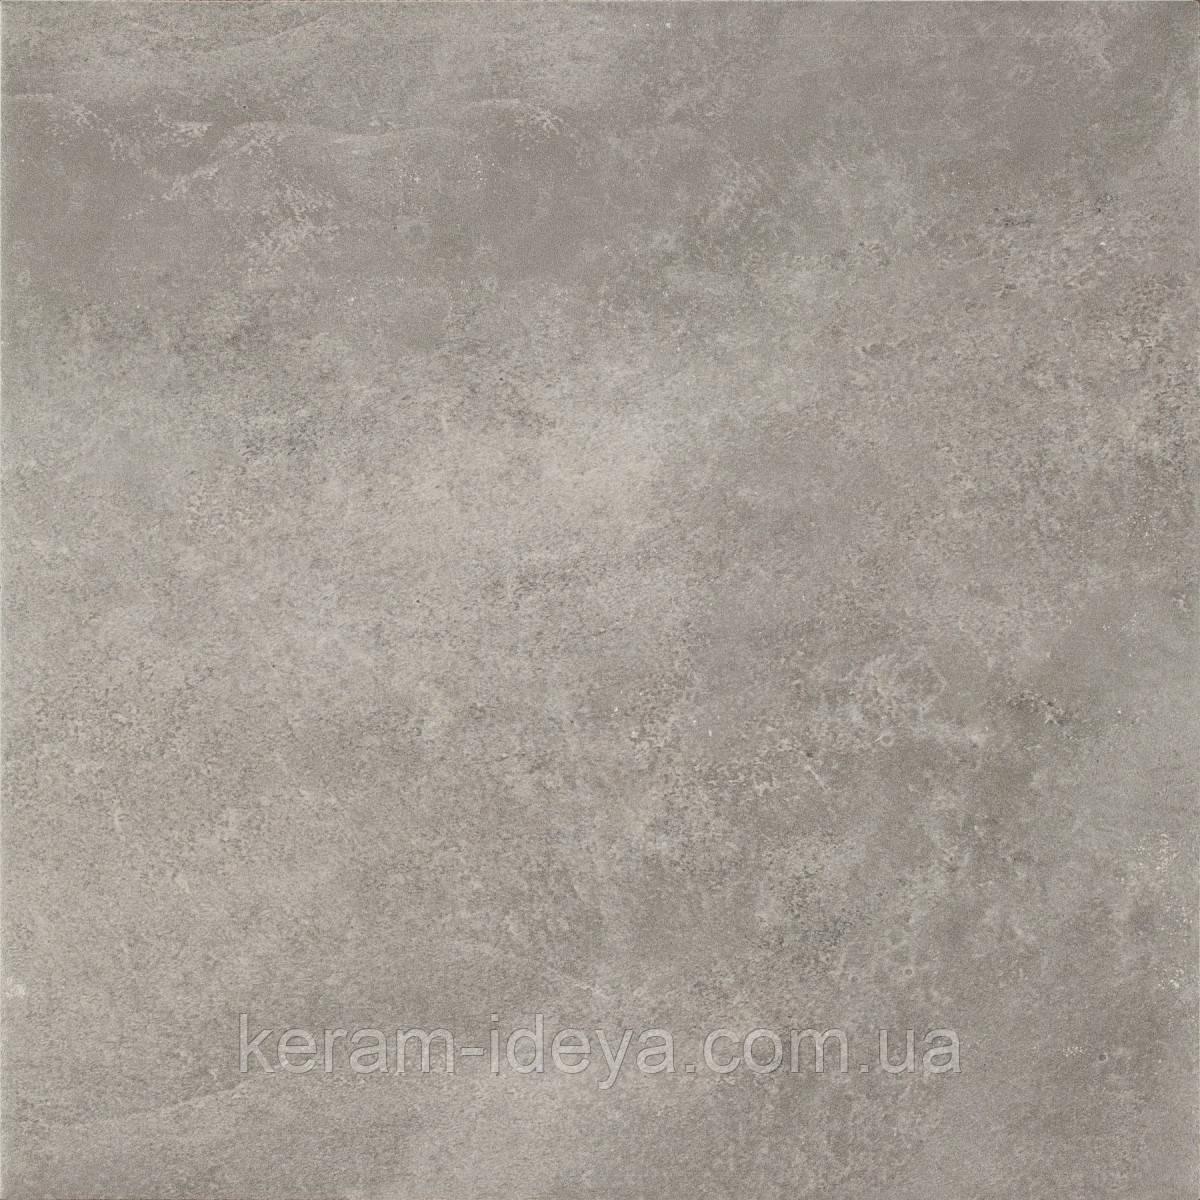 Грес для пола Cersanit Febe Dark Grey 42x42